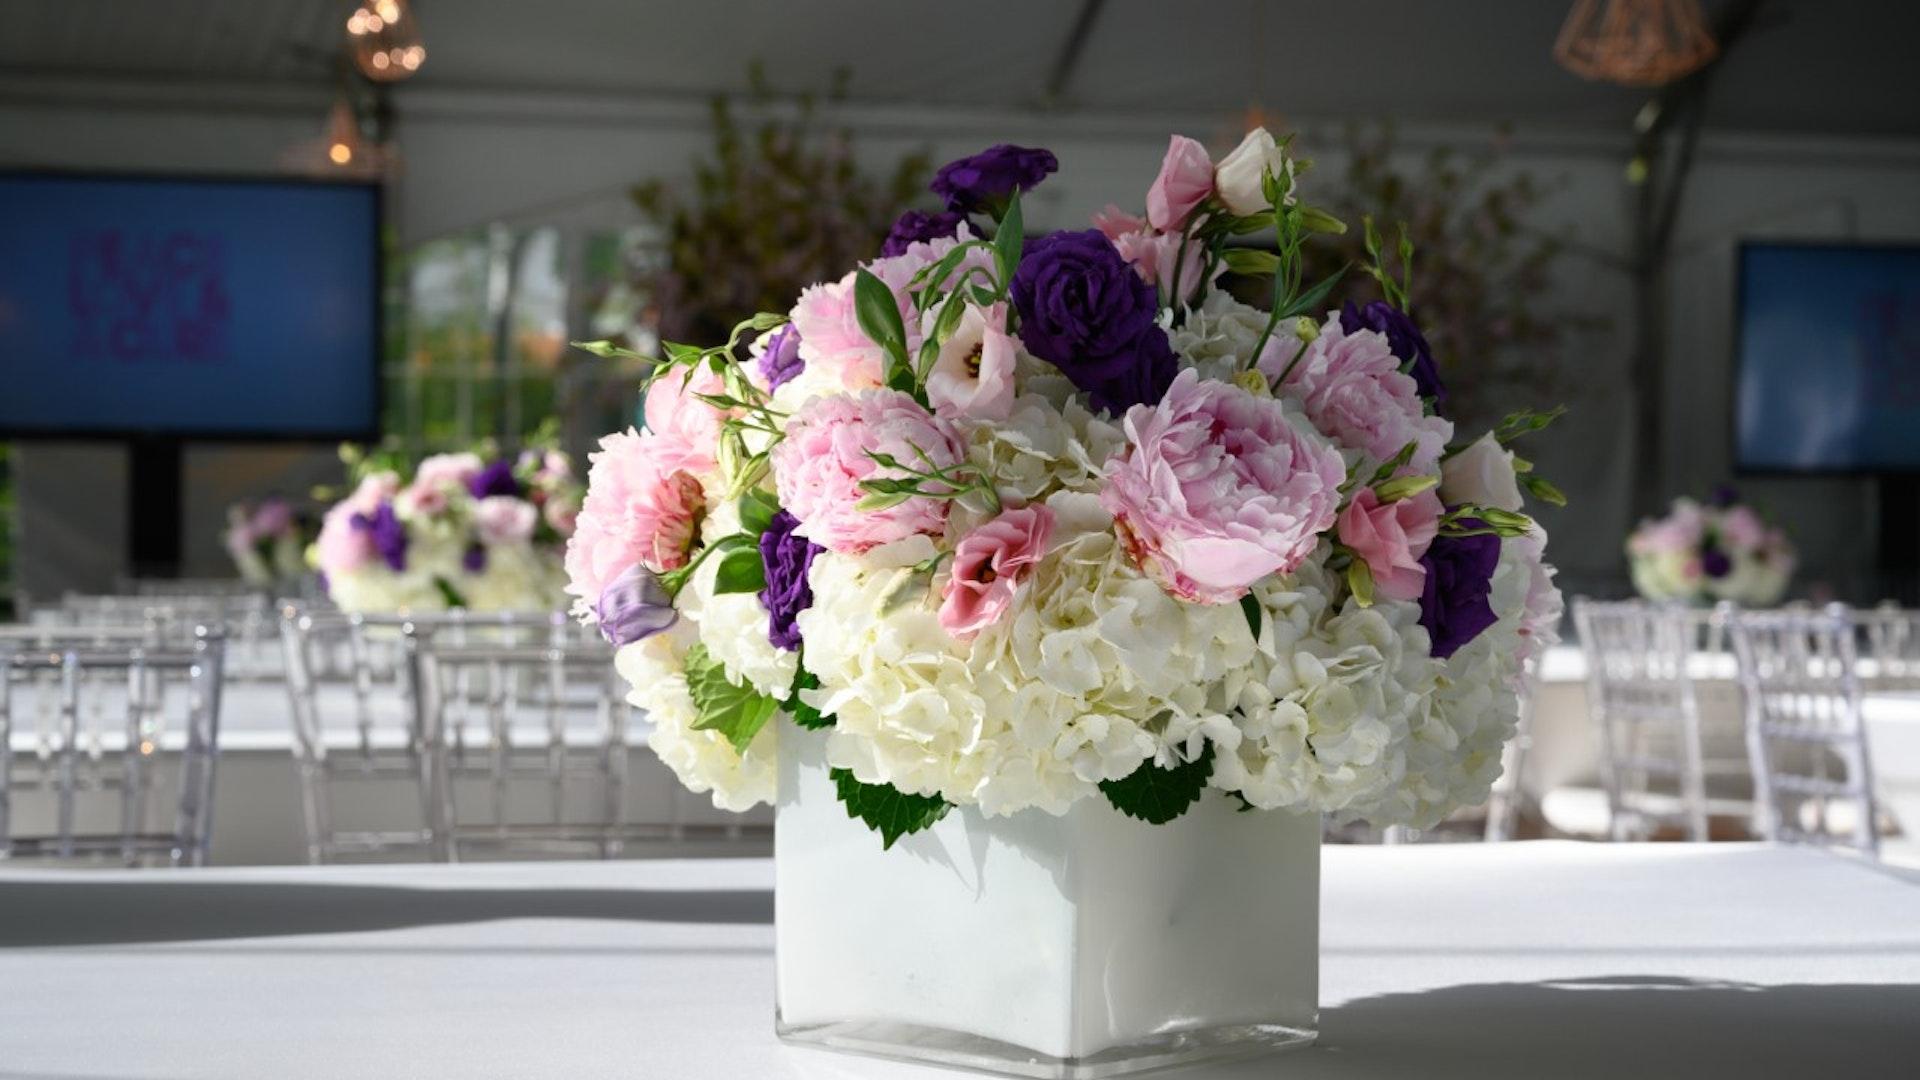 Plc Flowerpic